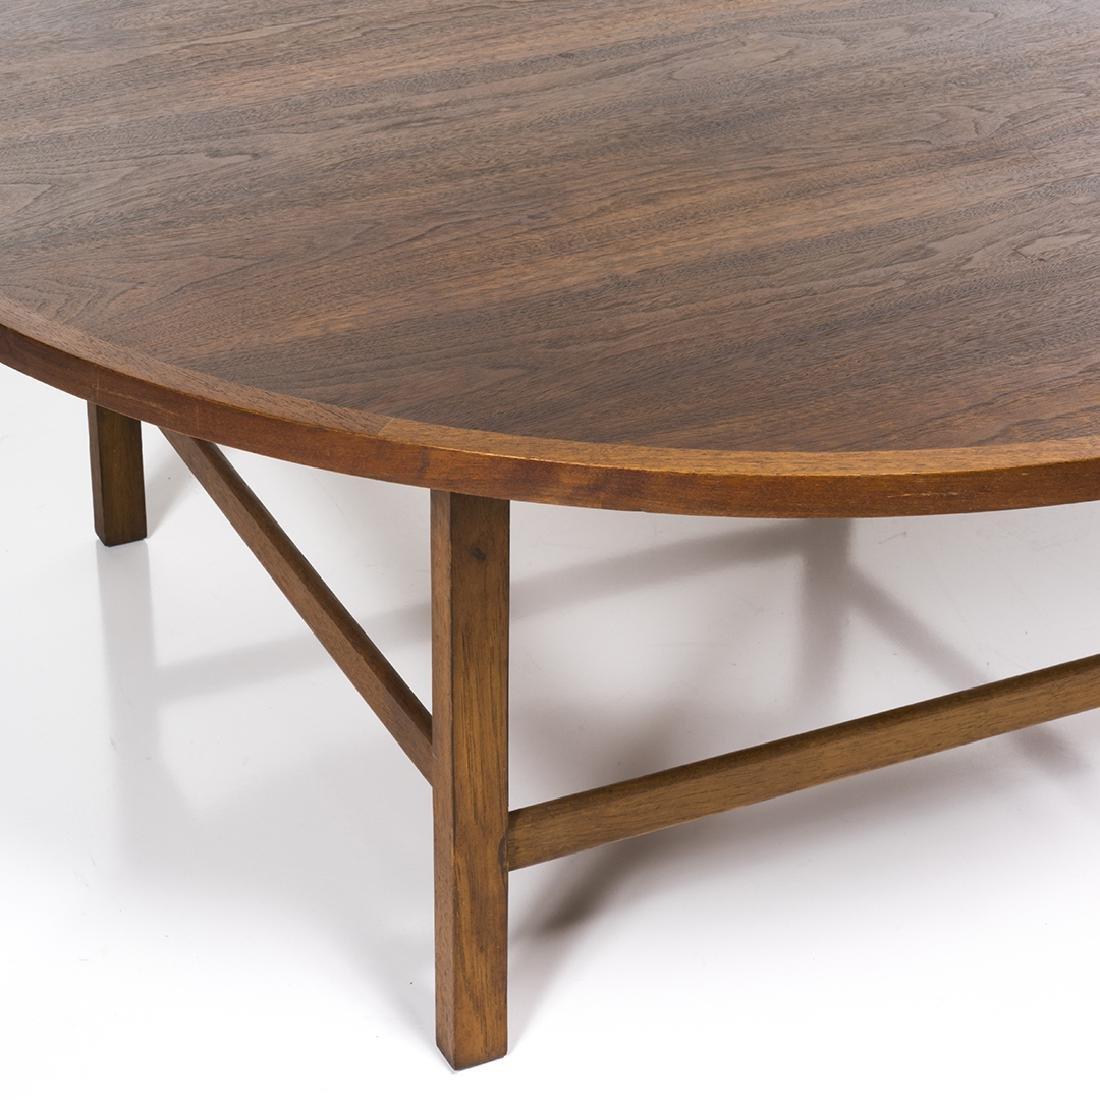 Paul McCobb Coffee Table - 4